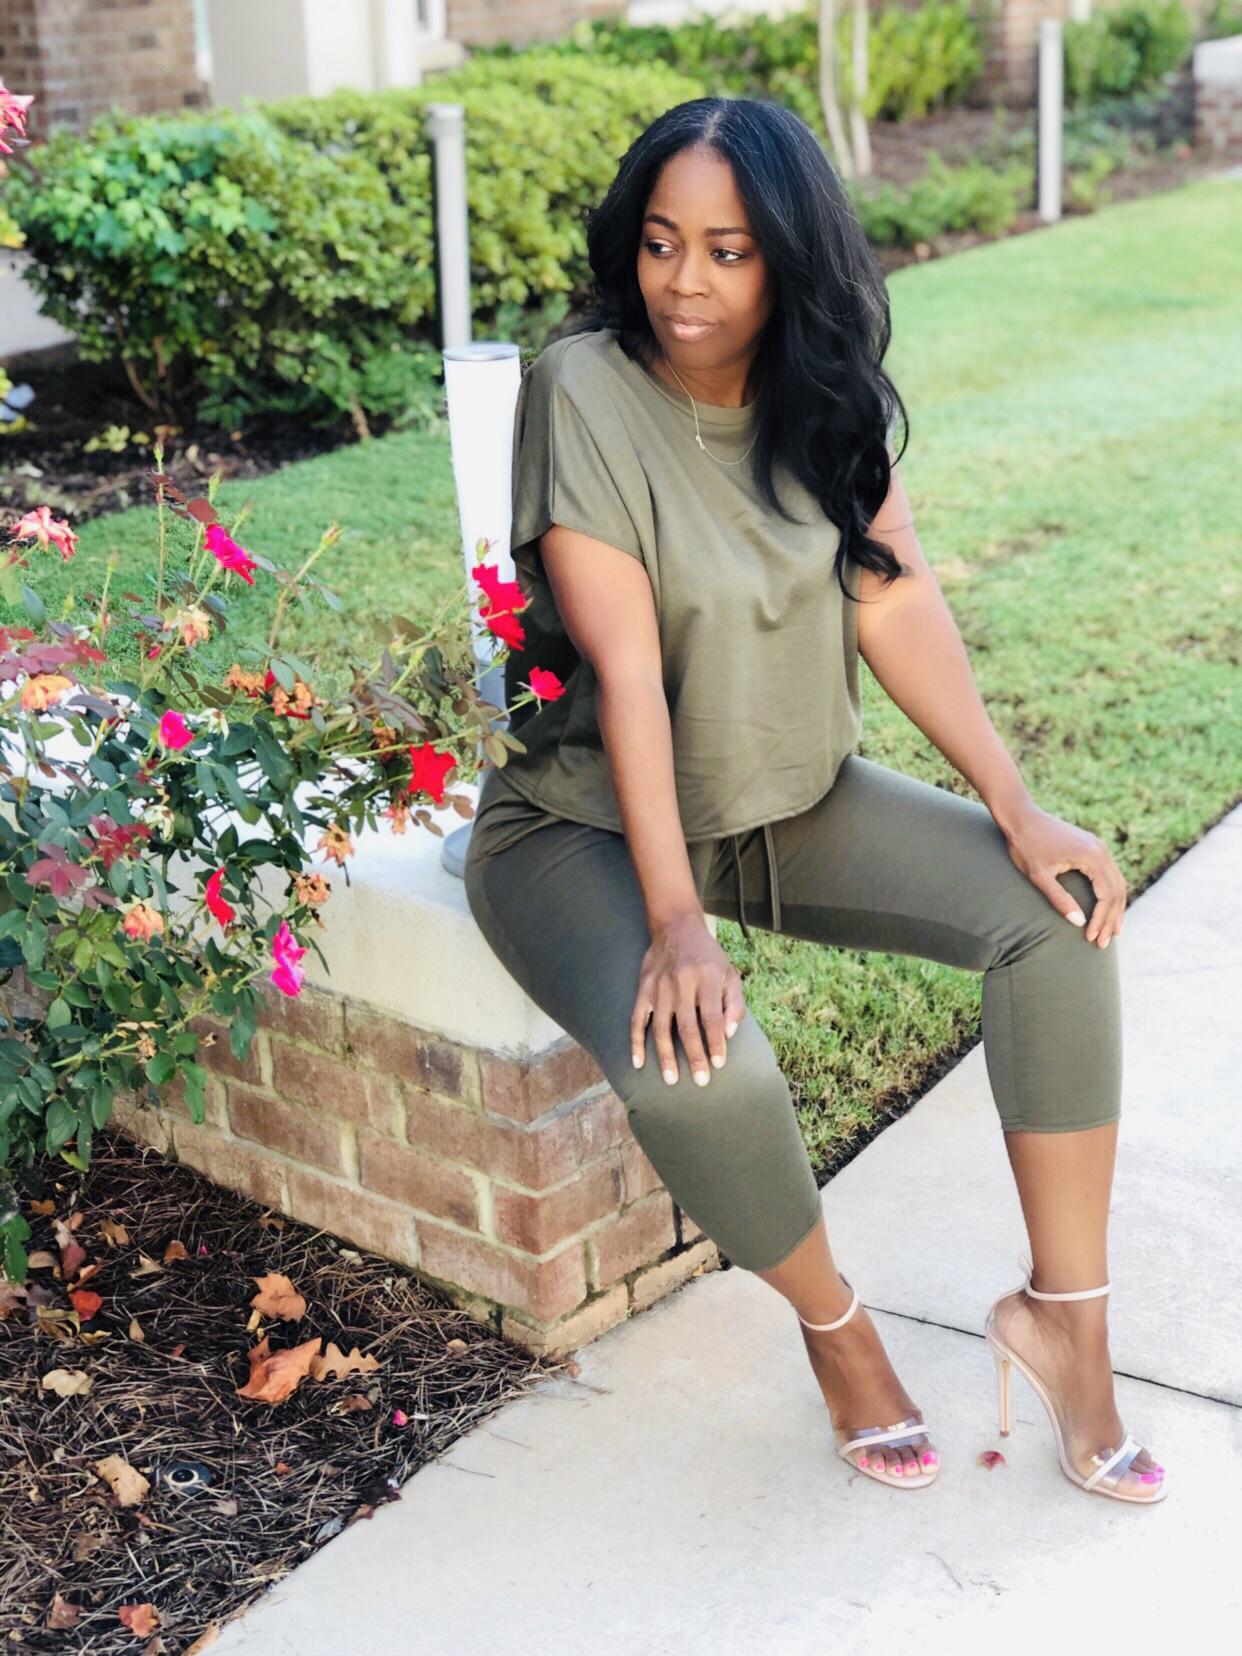 My Style: Khaki Short Sleeve Boxy Loungewear Set Lacy